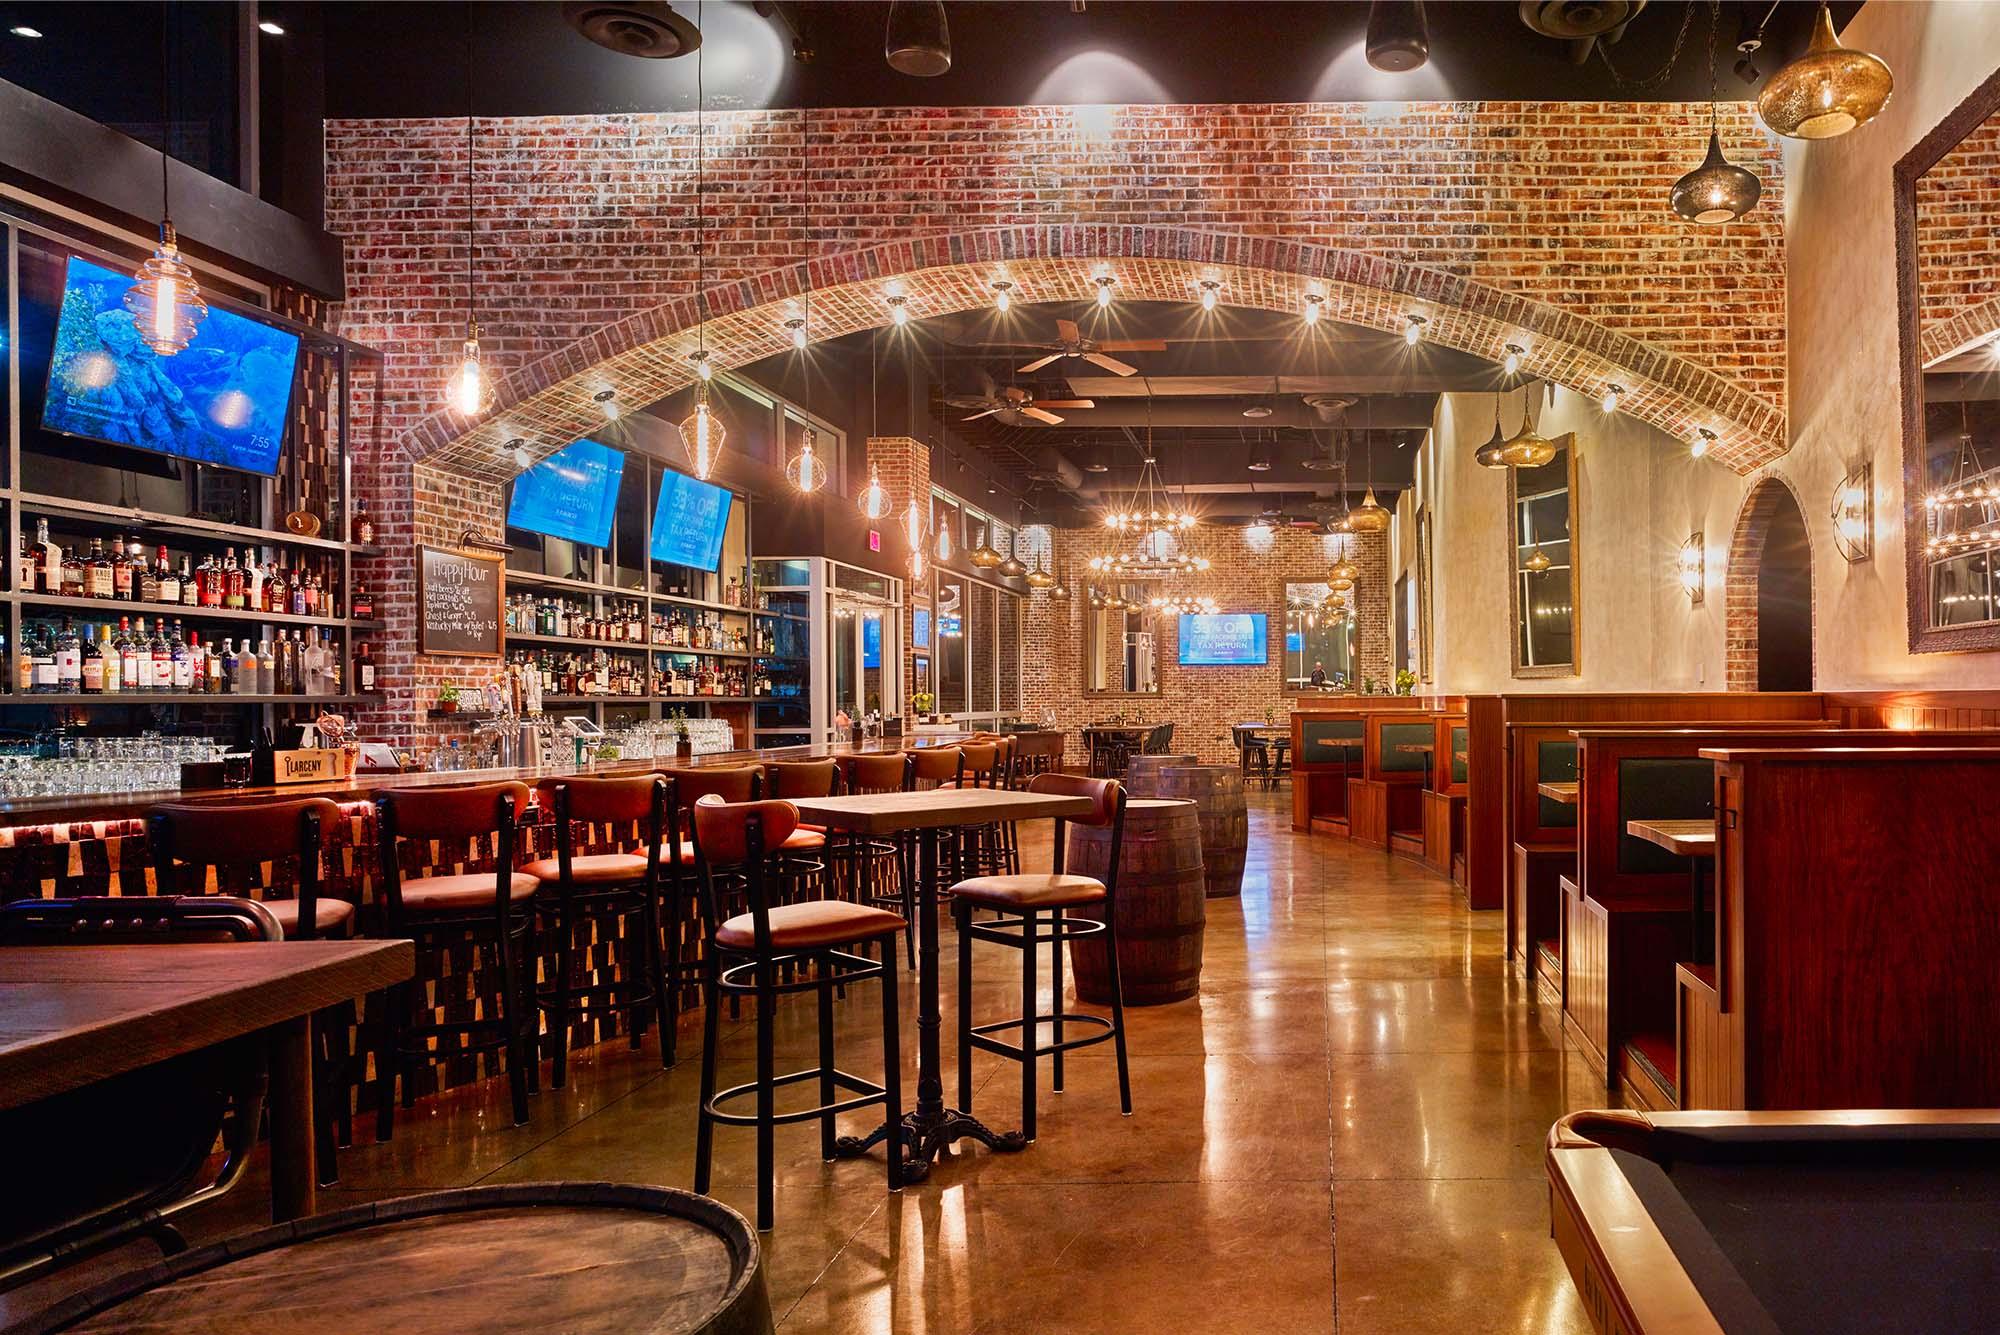 Frankie's Uptown Bar